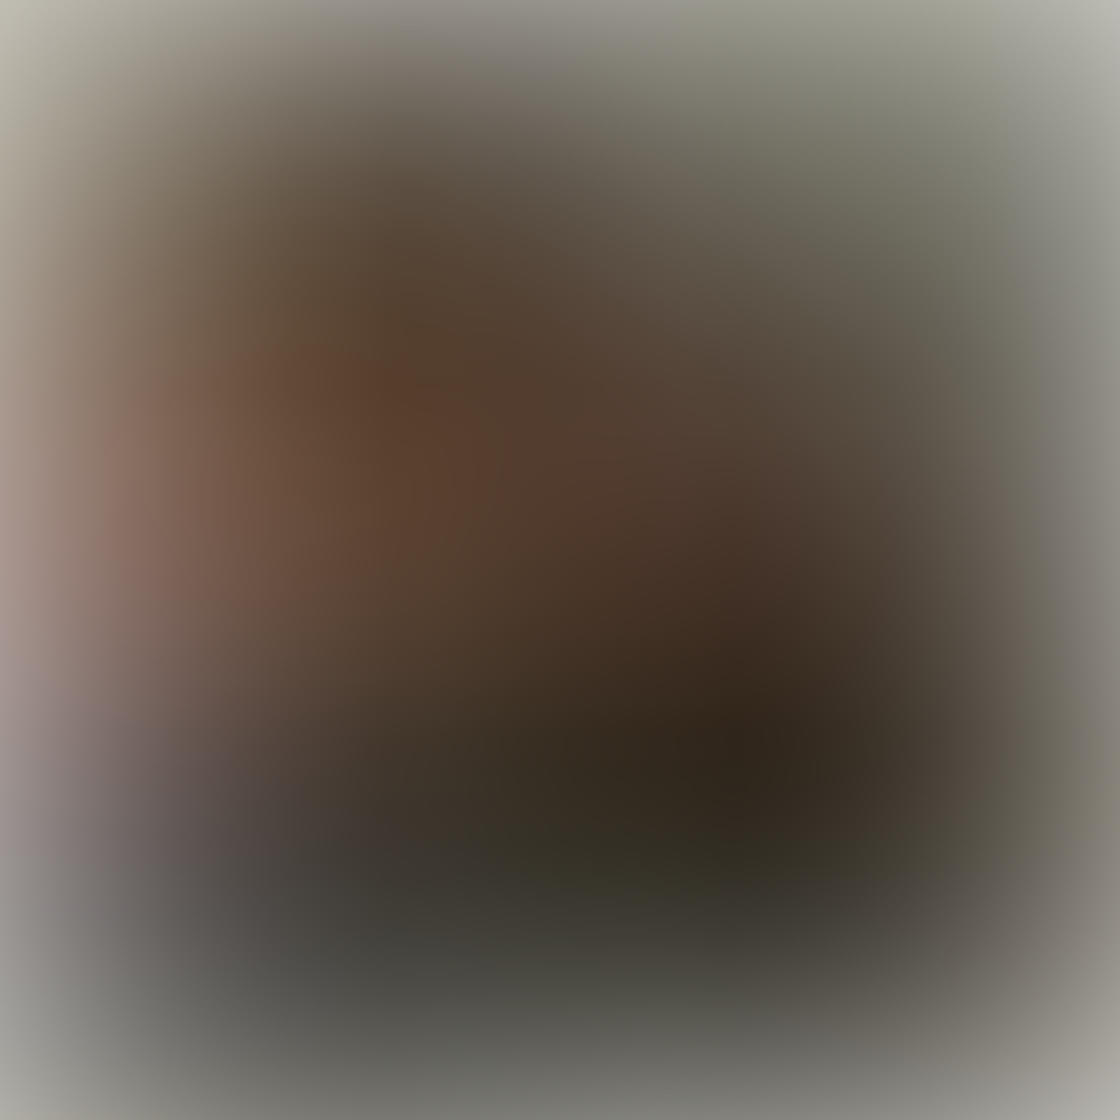 Kimberly Saxton-Heinrichs iPhone Photos 3